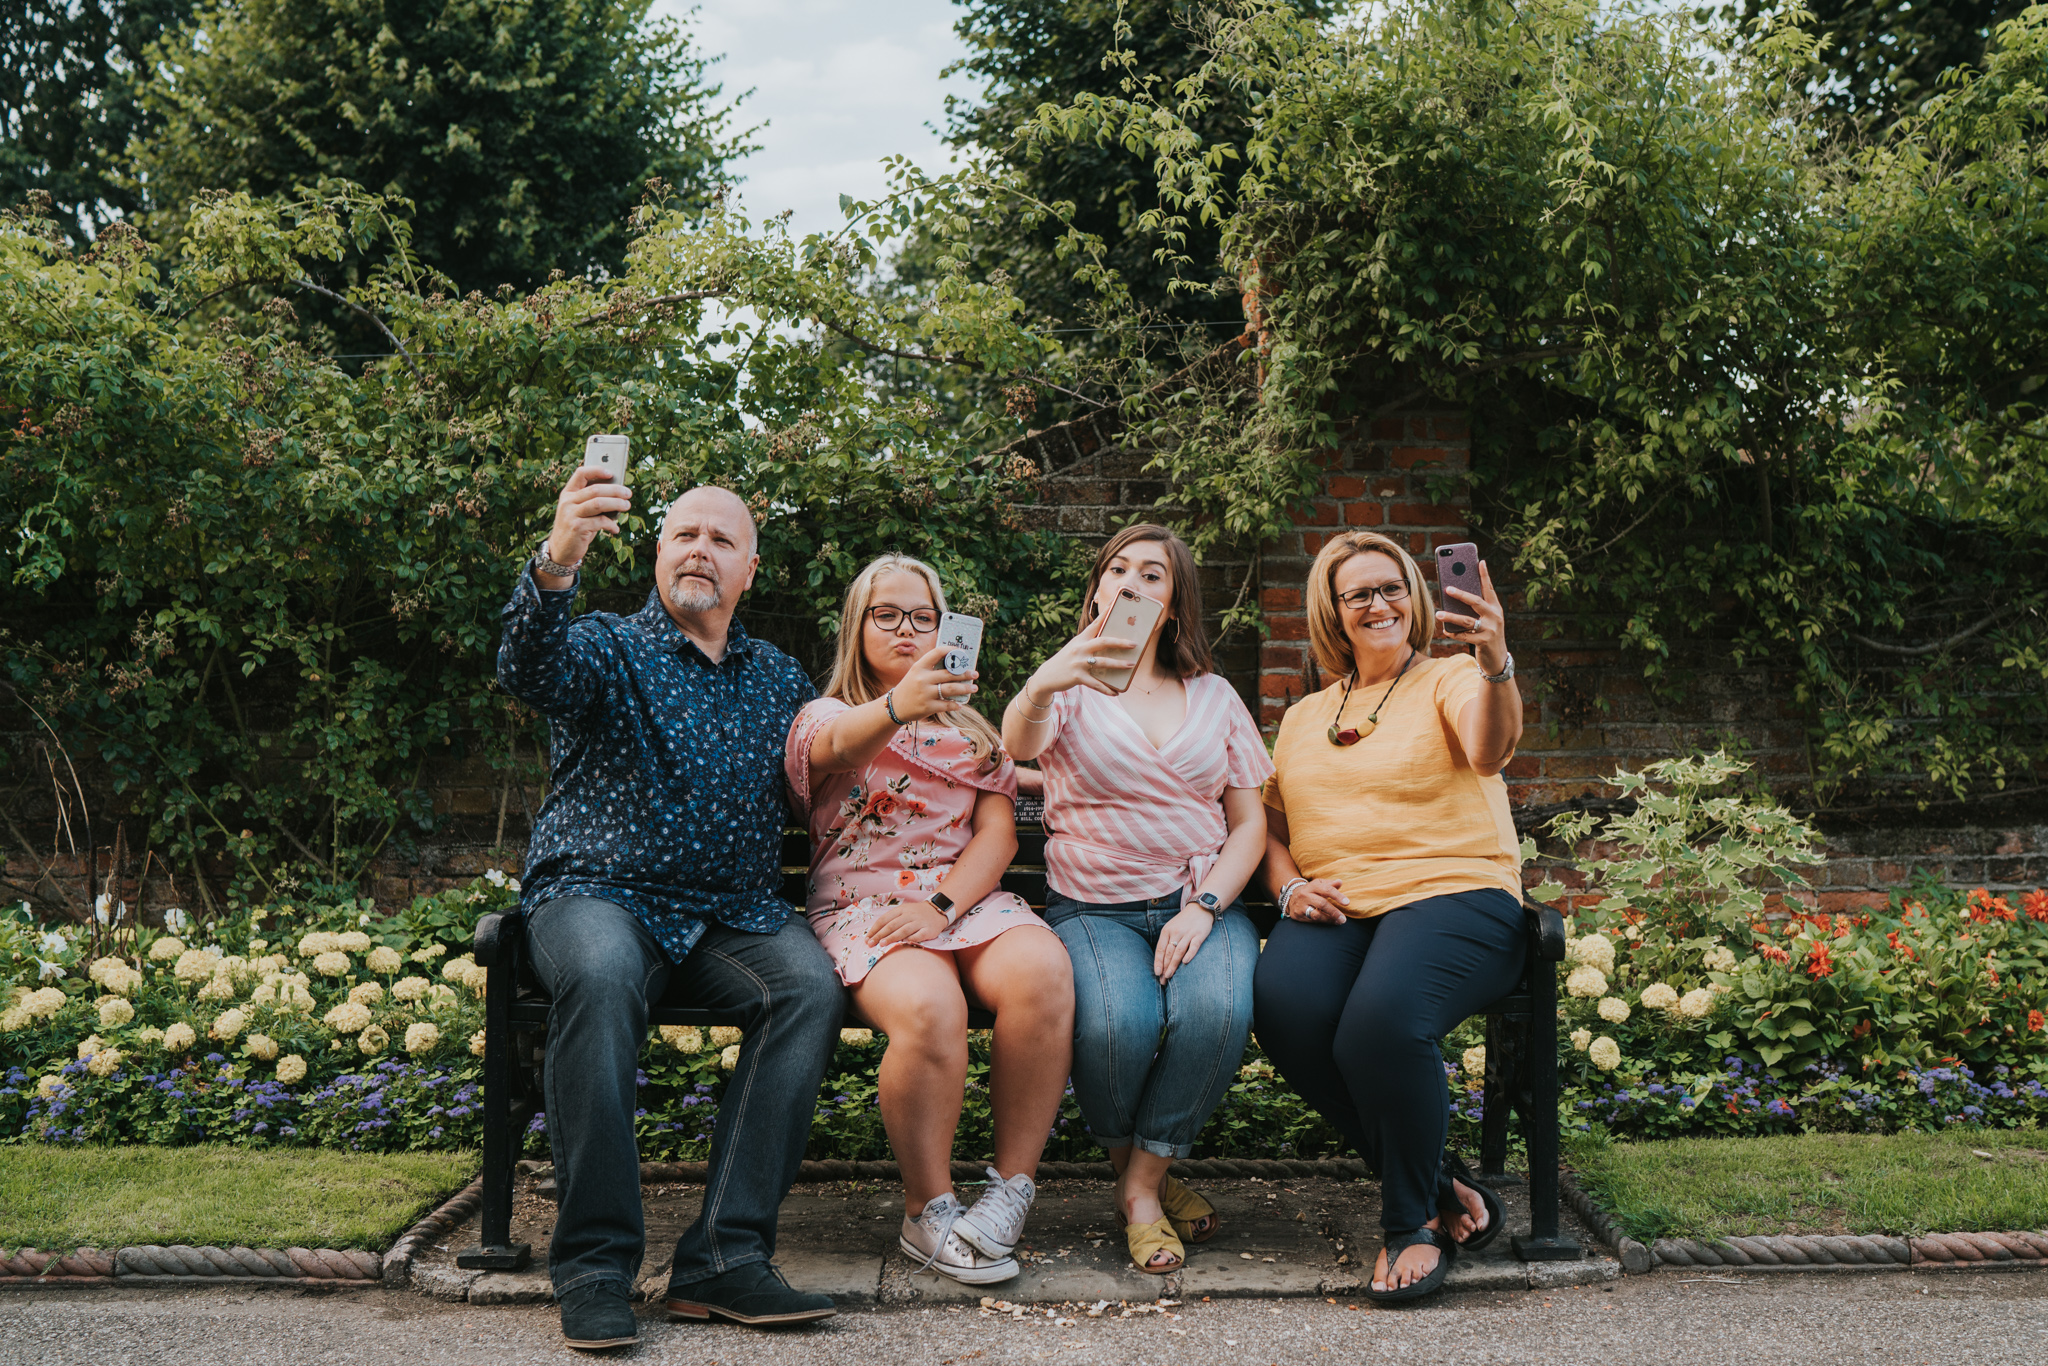 Fitch-Family-Colchester-Castle-Park-Grace-Elizabeth-Alternative-Wedding-Lifestyle-Photographer-Colchester-Essex-Suffolk-Norfolk-Devon (33 of 41).jpg